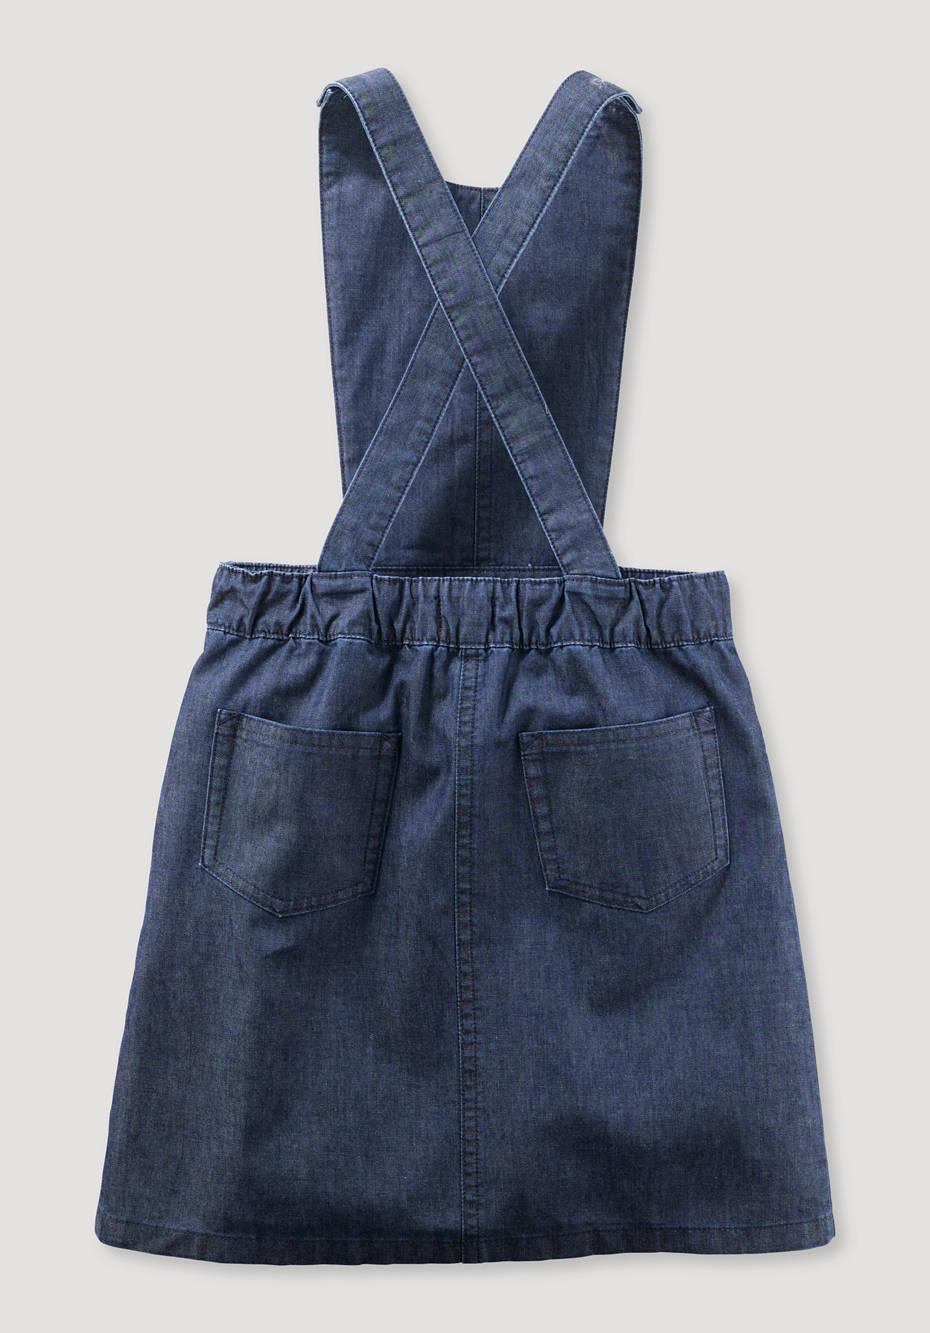 Bib dress made from pure organic denim